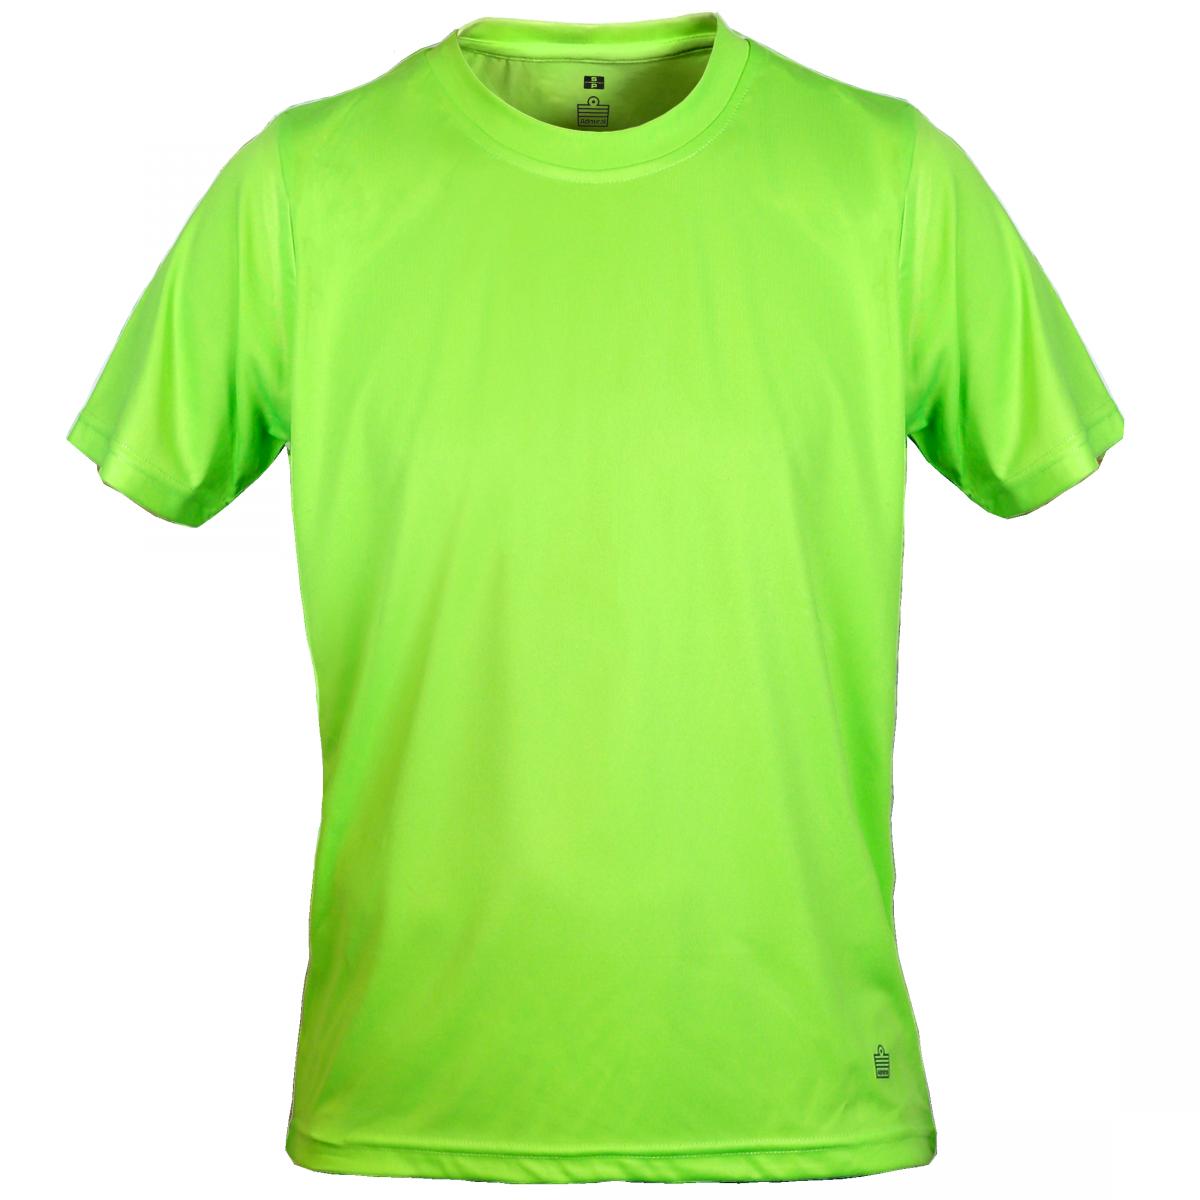 Admiral Performance Jersey-Neon Green-2XL